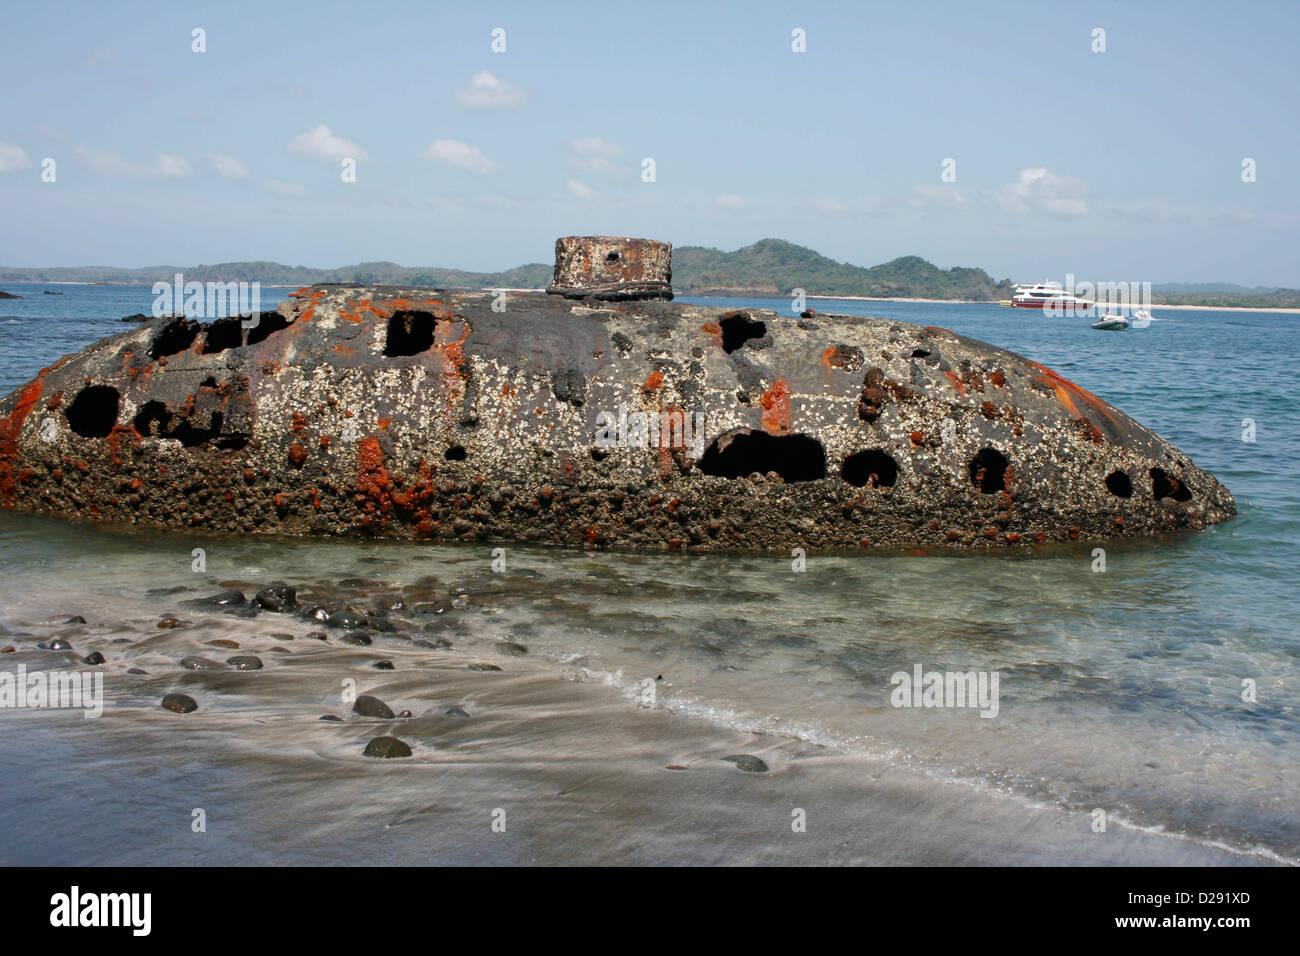 Panama, American Civil War Submarine Sunk Off Las Perlas Islands - Stock Image